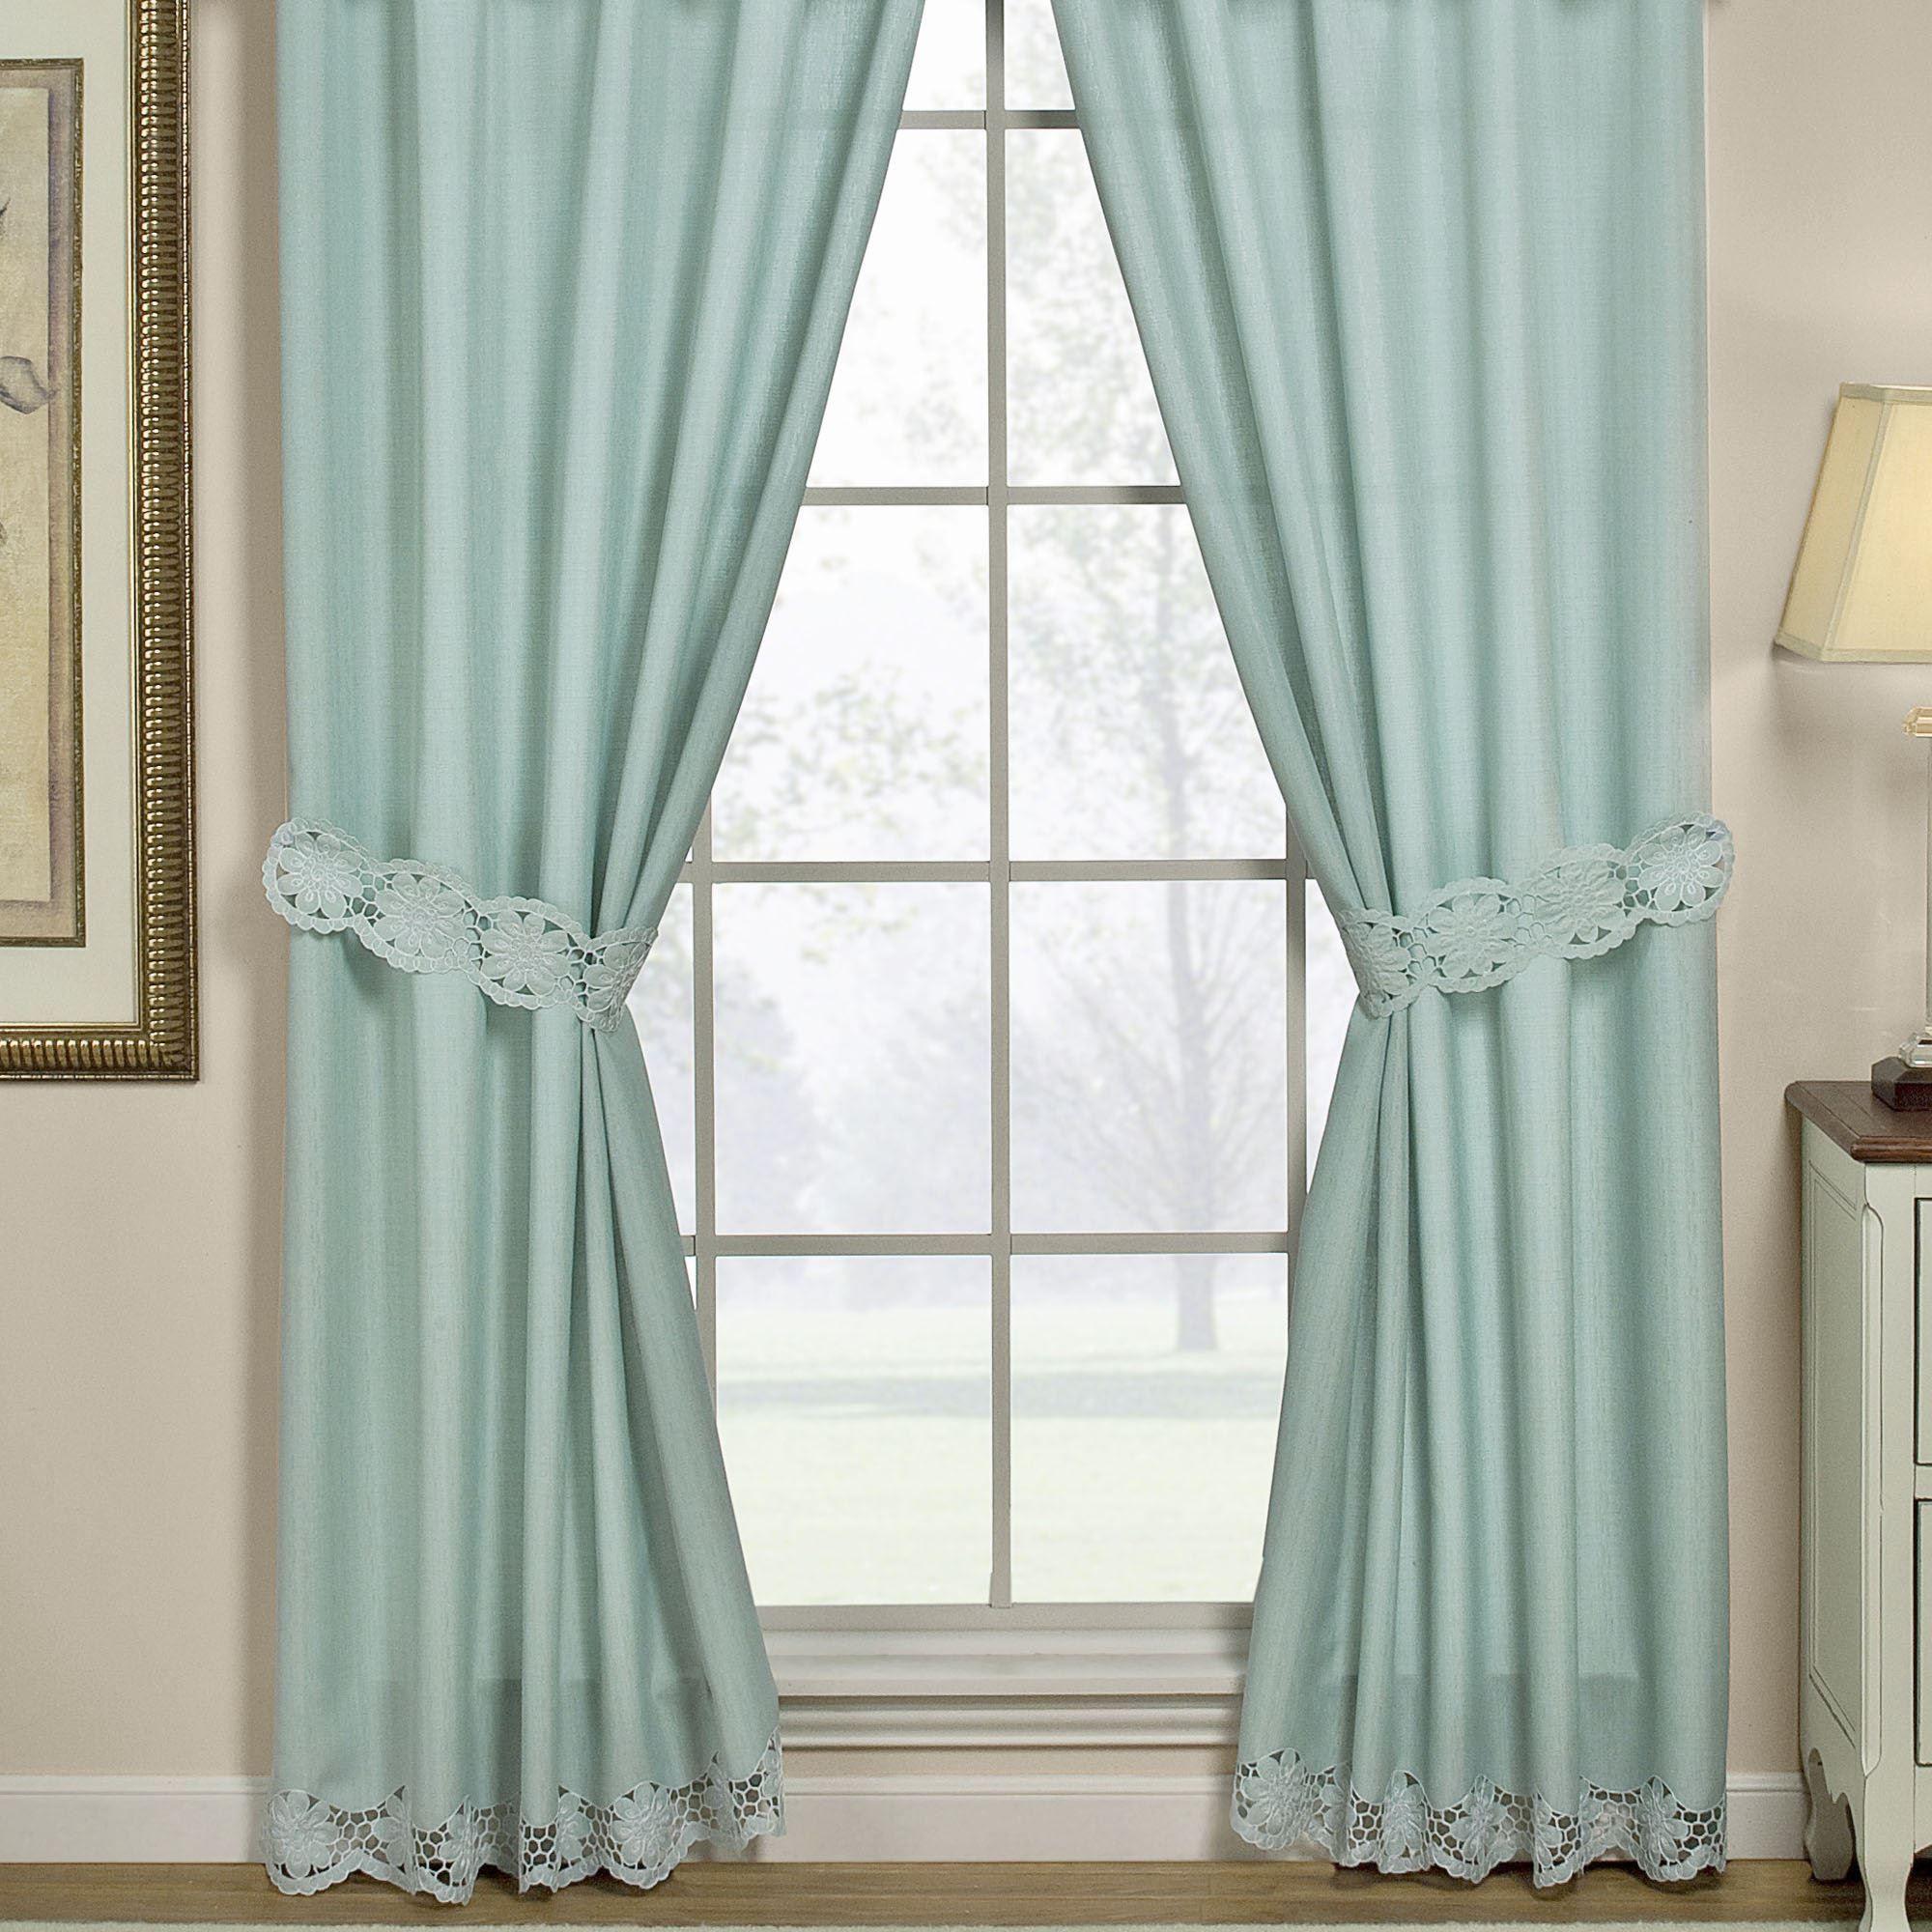 size bay rod amazing curtain ideas double window full treatments